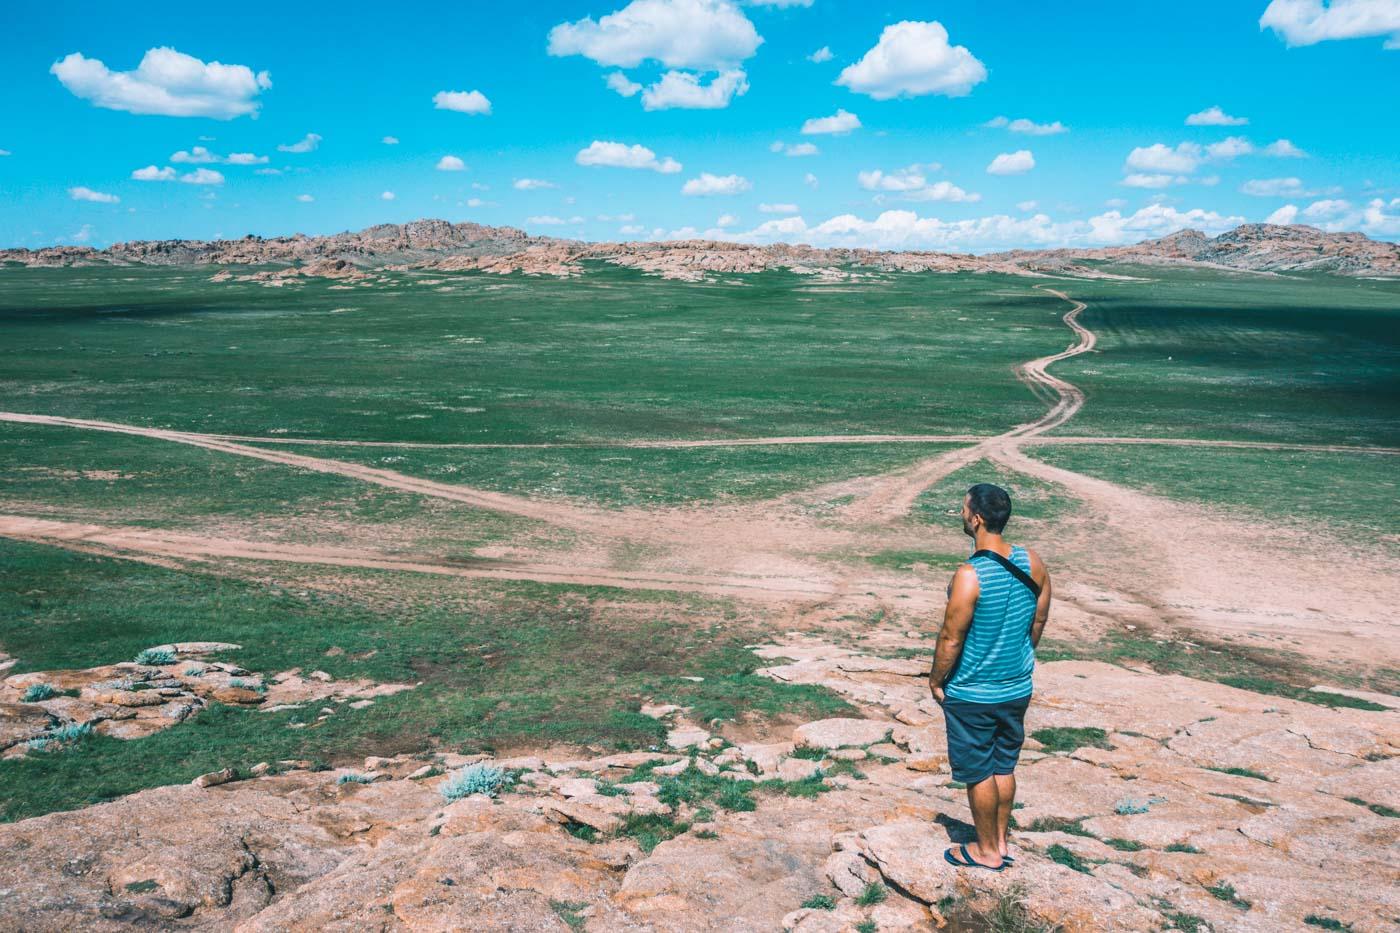 Overlooking the steppe at Baga Gazriin Chuluu, Gobi Desert